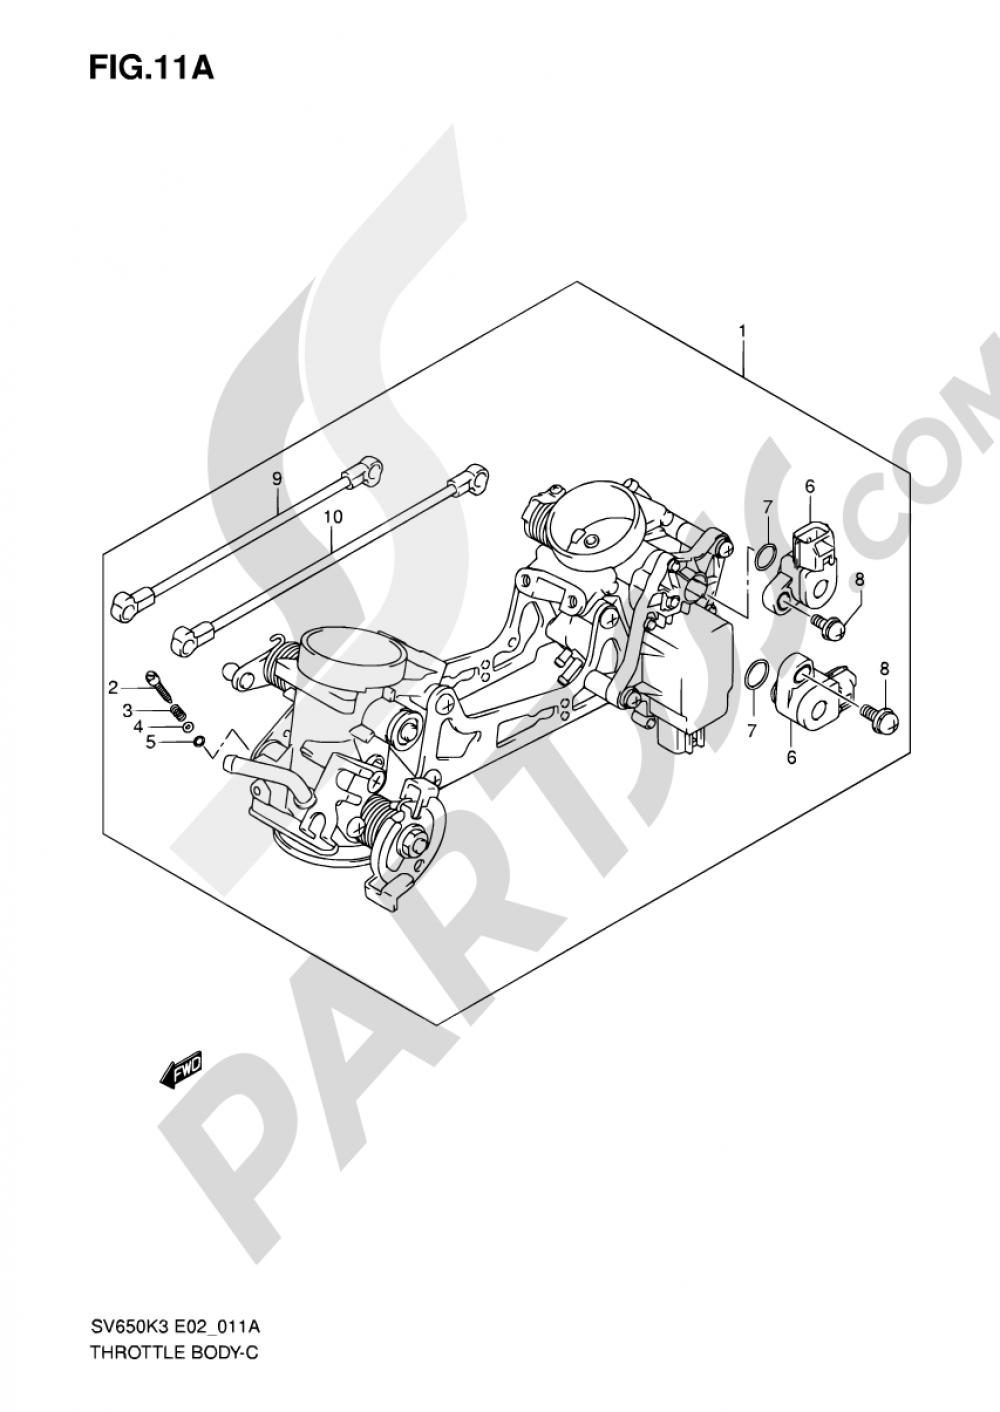 11A - THROTTLE BODY (MODEL K7) Suzuki SV650 2007